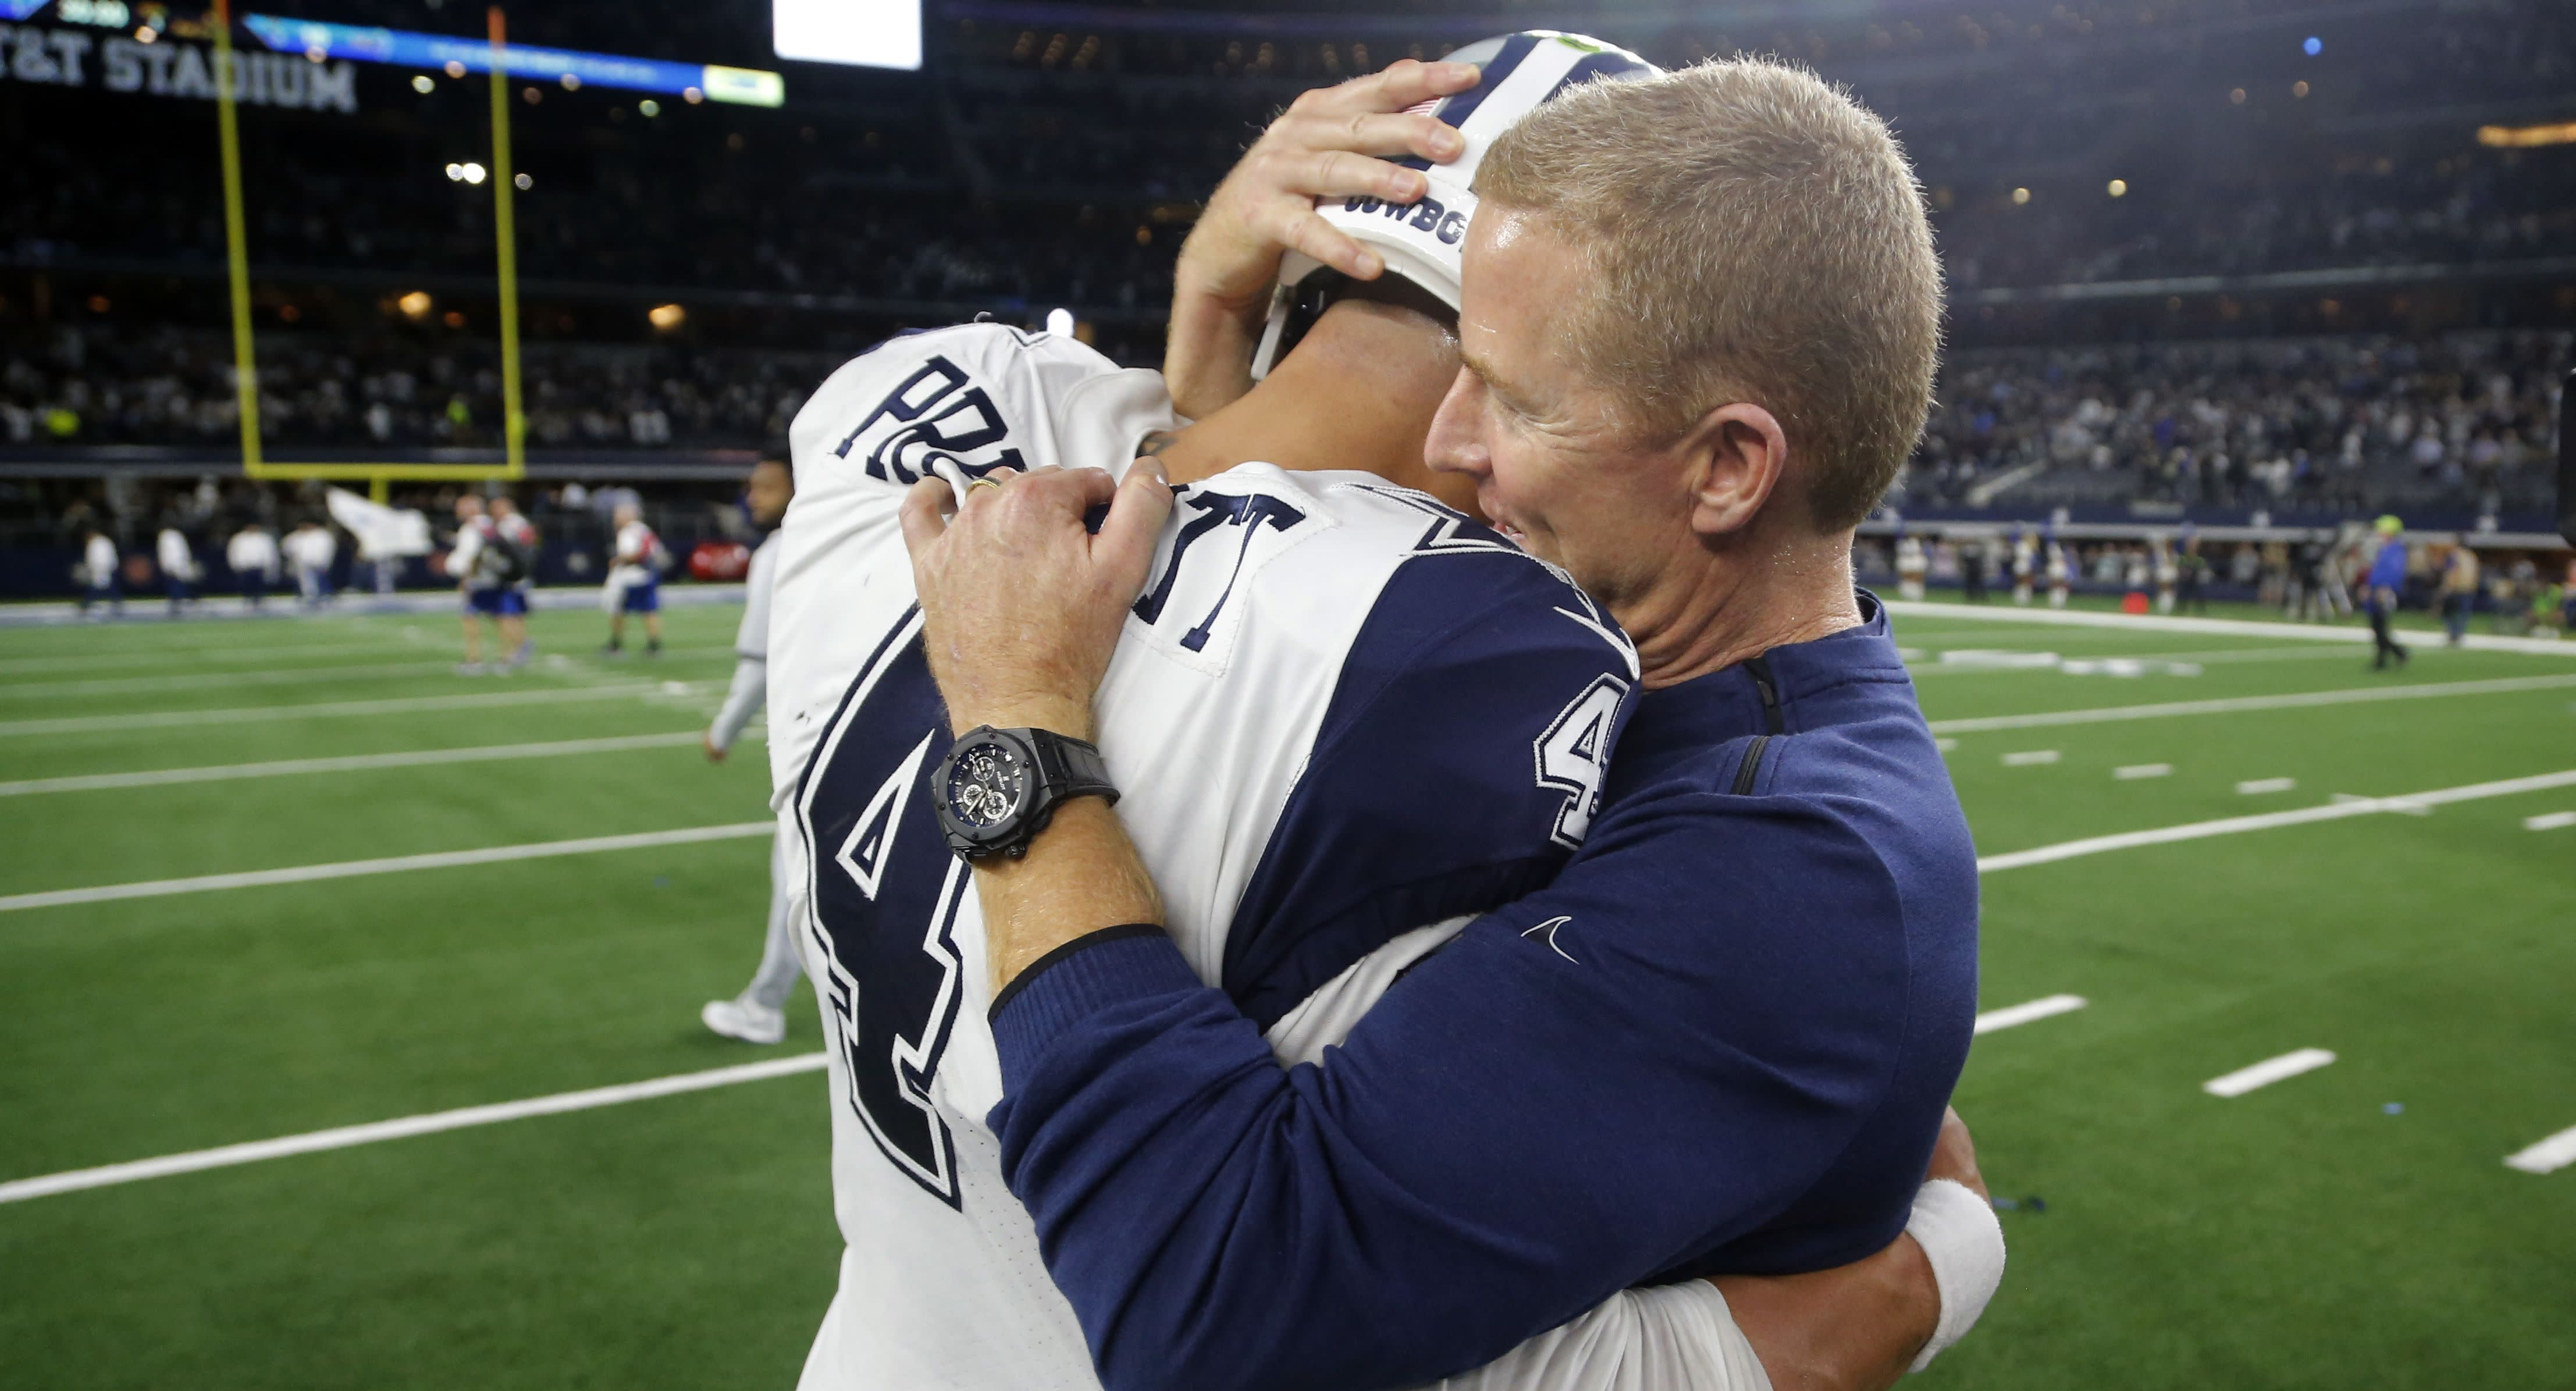 Cowboys  massive win likely saved Garrett s job 6979ce494